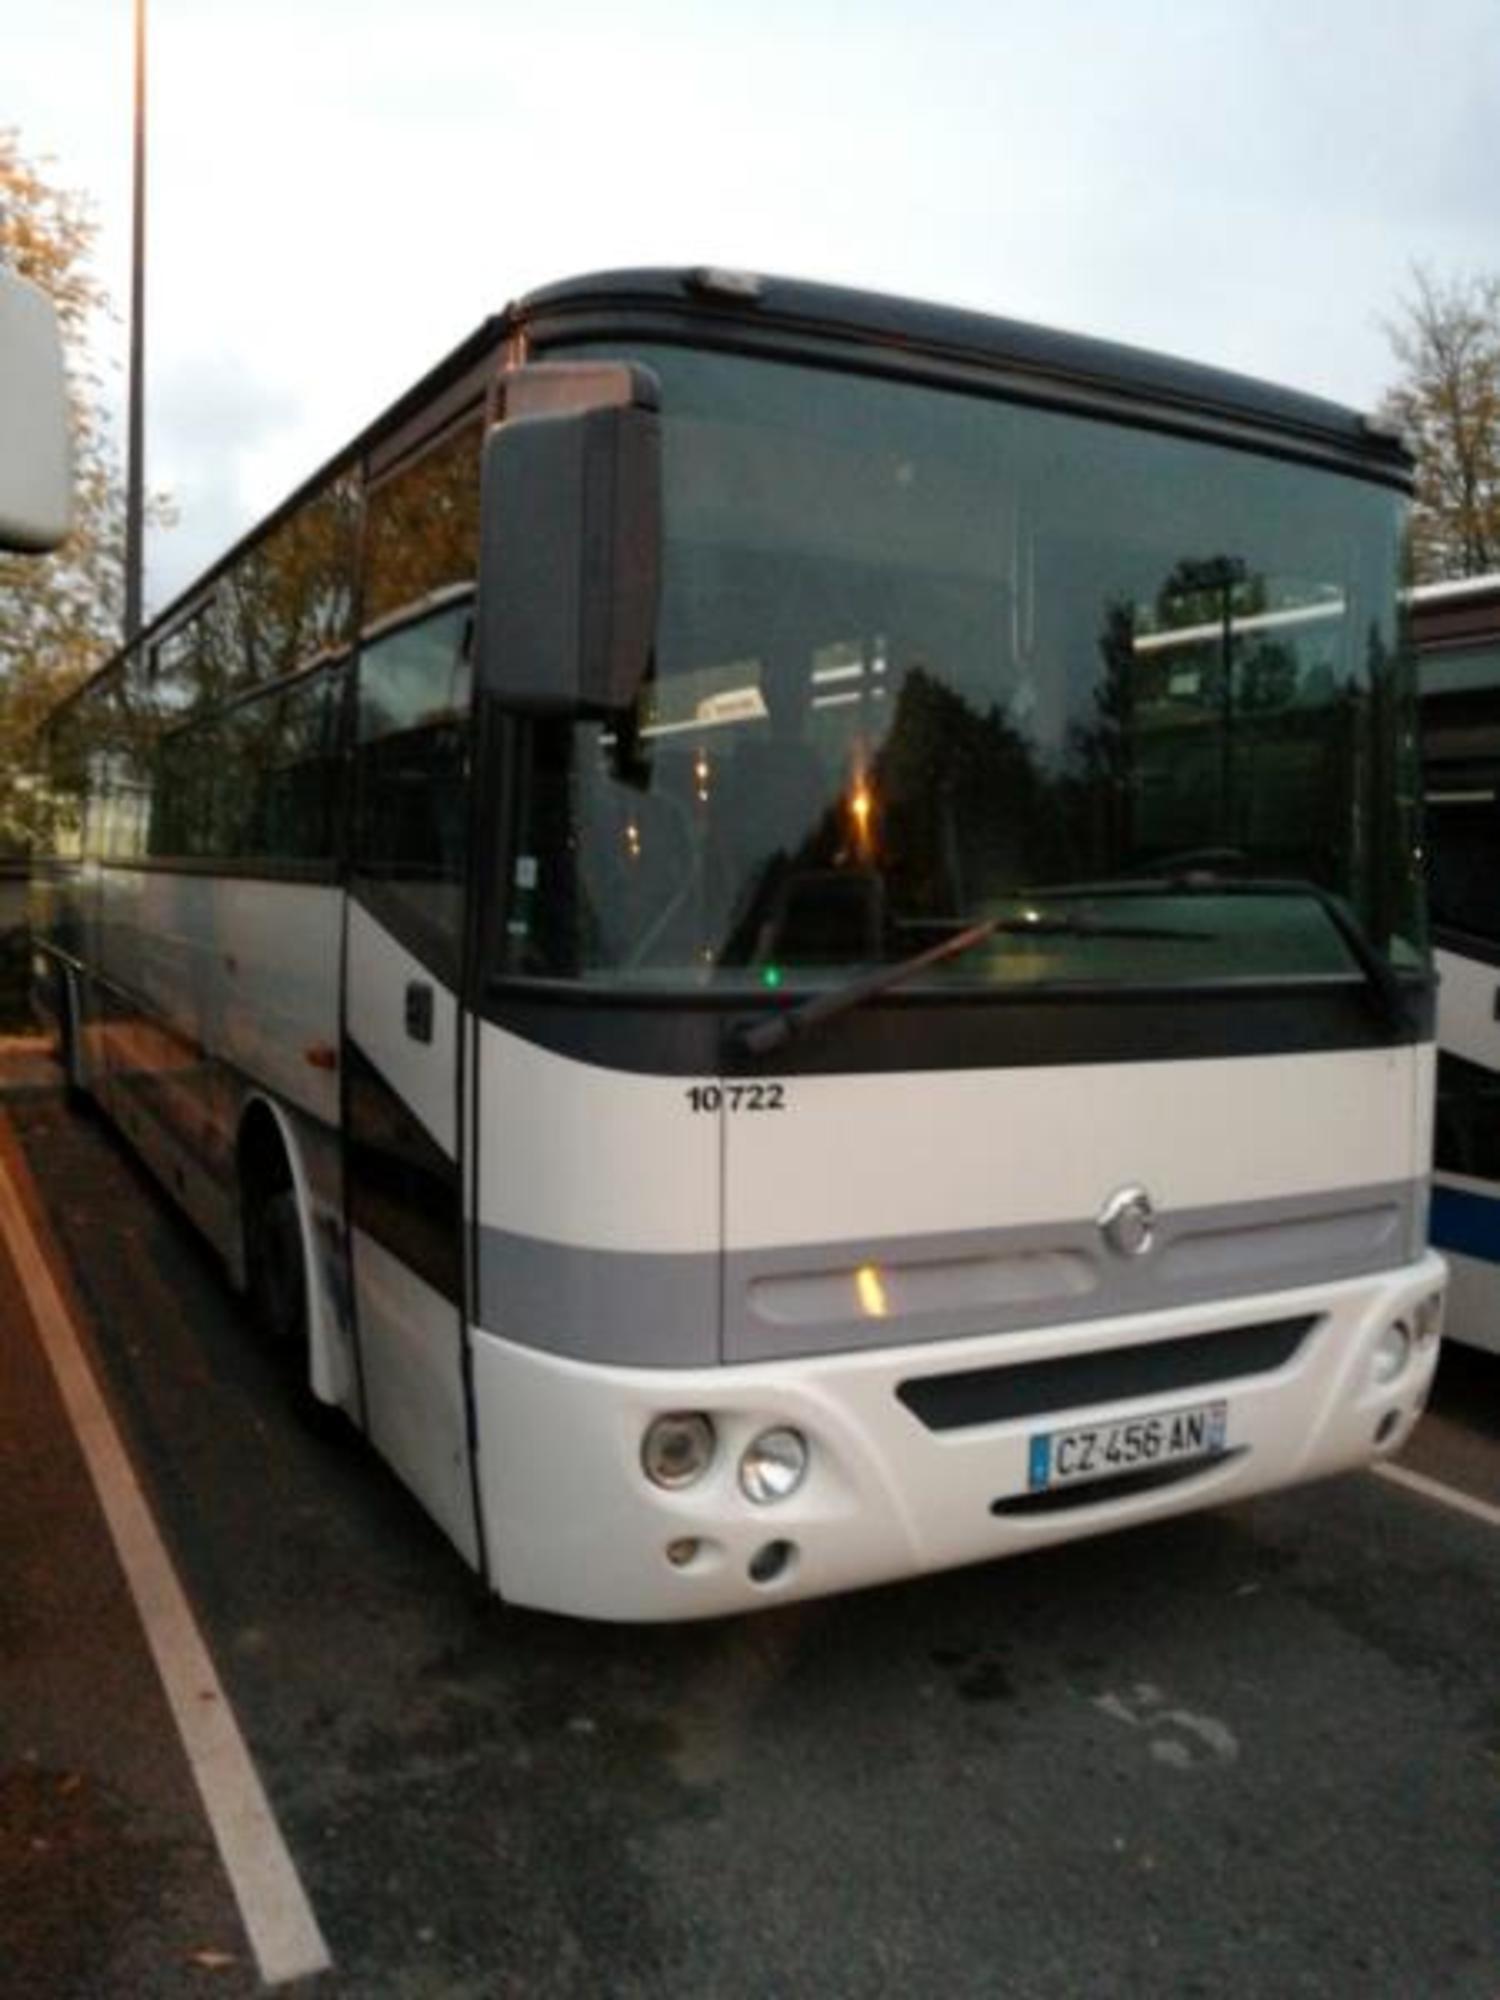 irisbus axer 10722 car bus d 39 occasion aux ench res agorastore. Black Bedroom Furniture Sets. Home Design Ideas